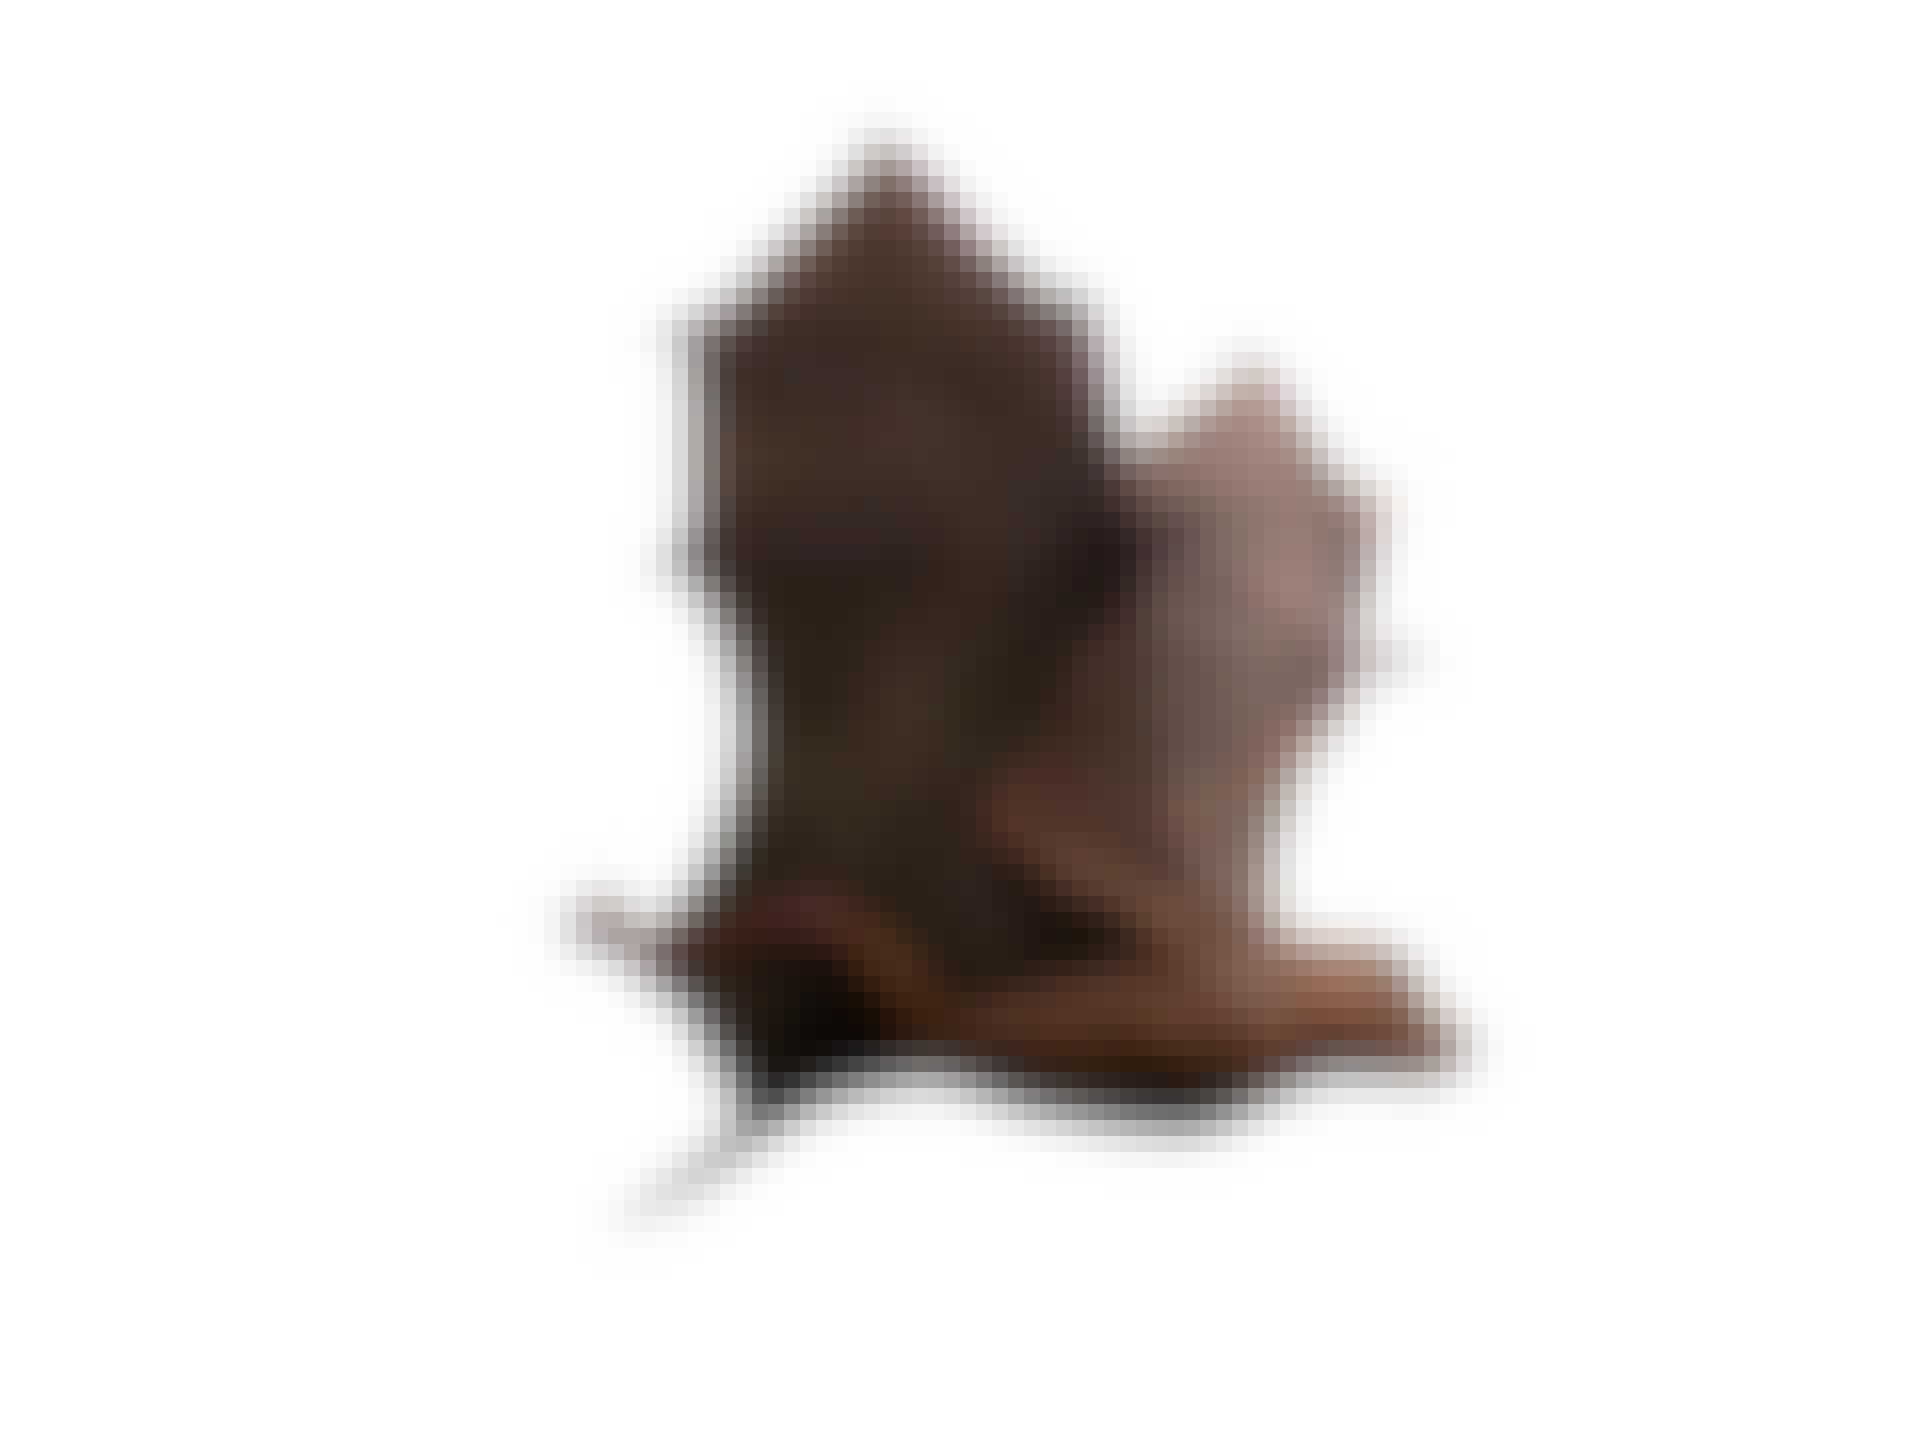 Onychonycteris finneryi, verdens første flaggermus